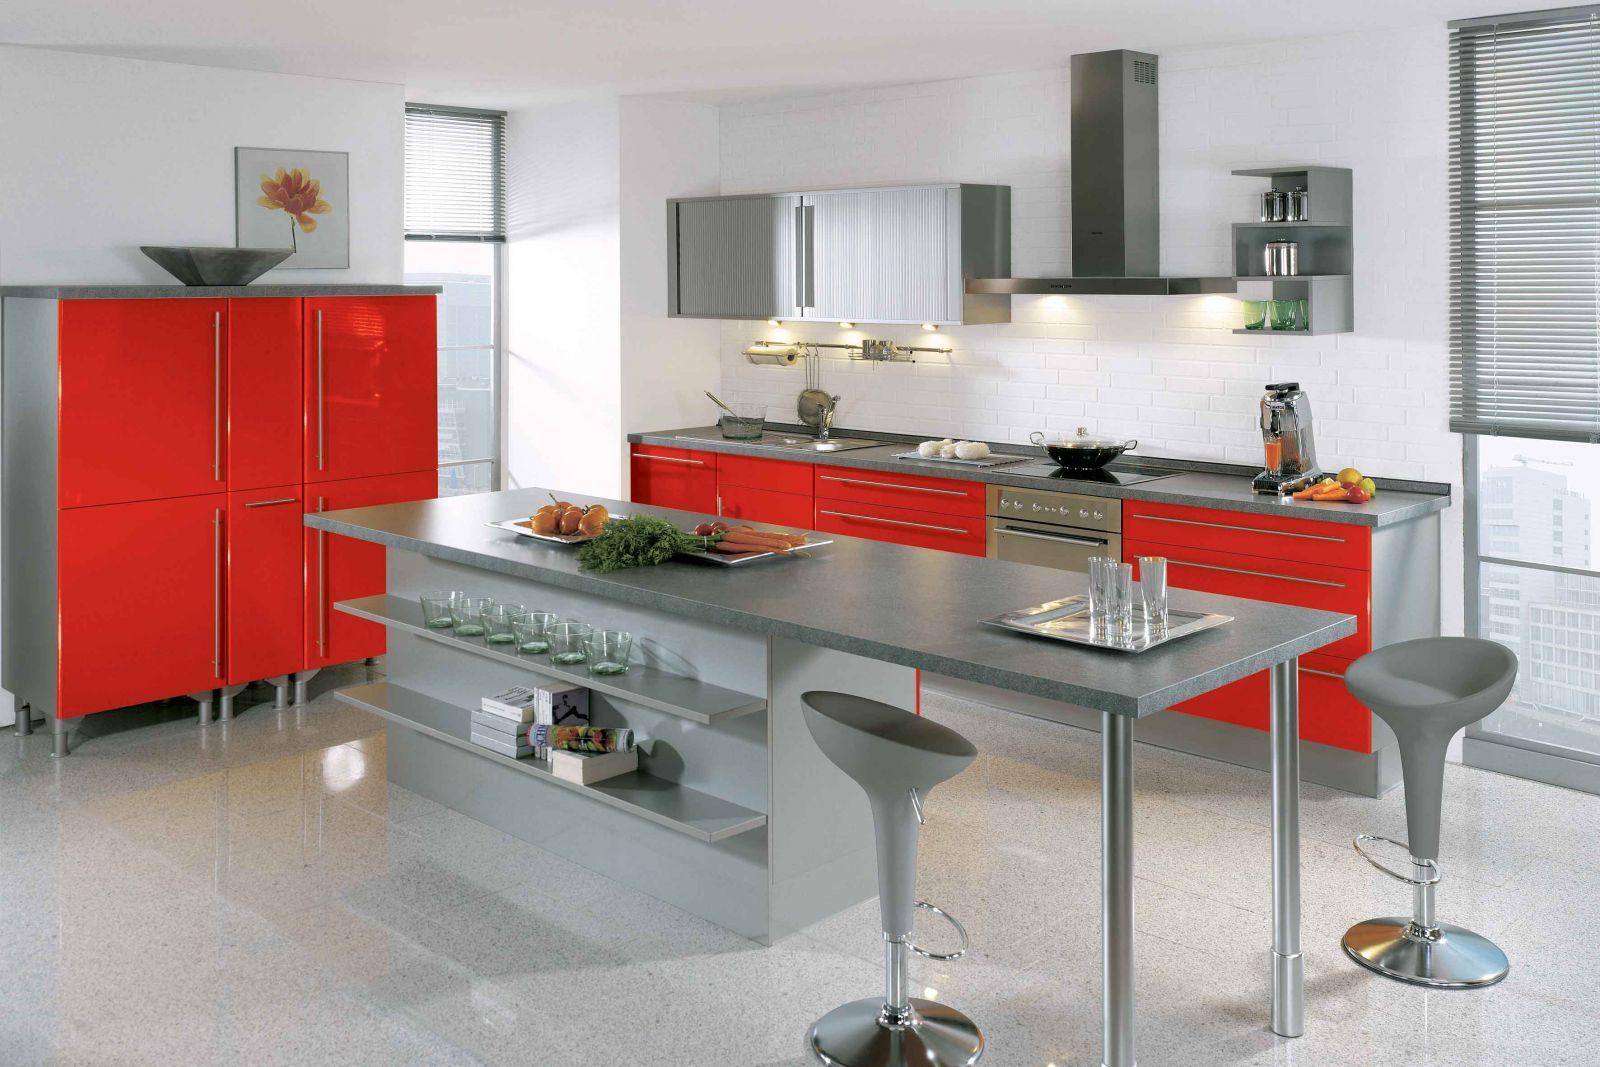 pin by hdinterior on kitchen european kitchen cabinets two tone kitchen cabinets kitchen on kitchen ideas european id=78617